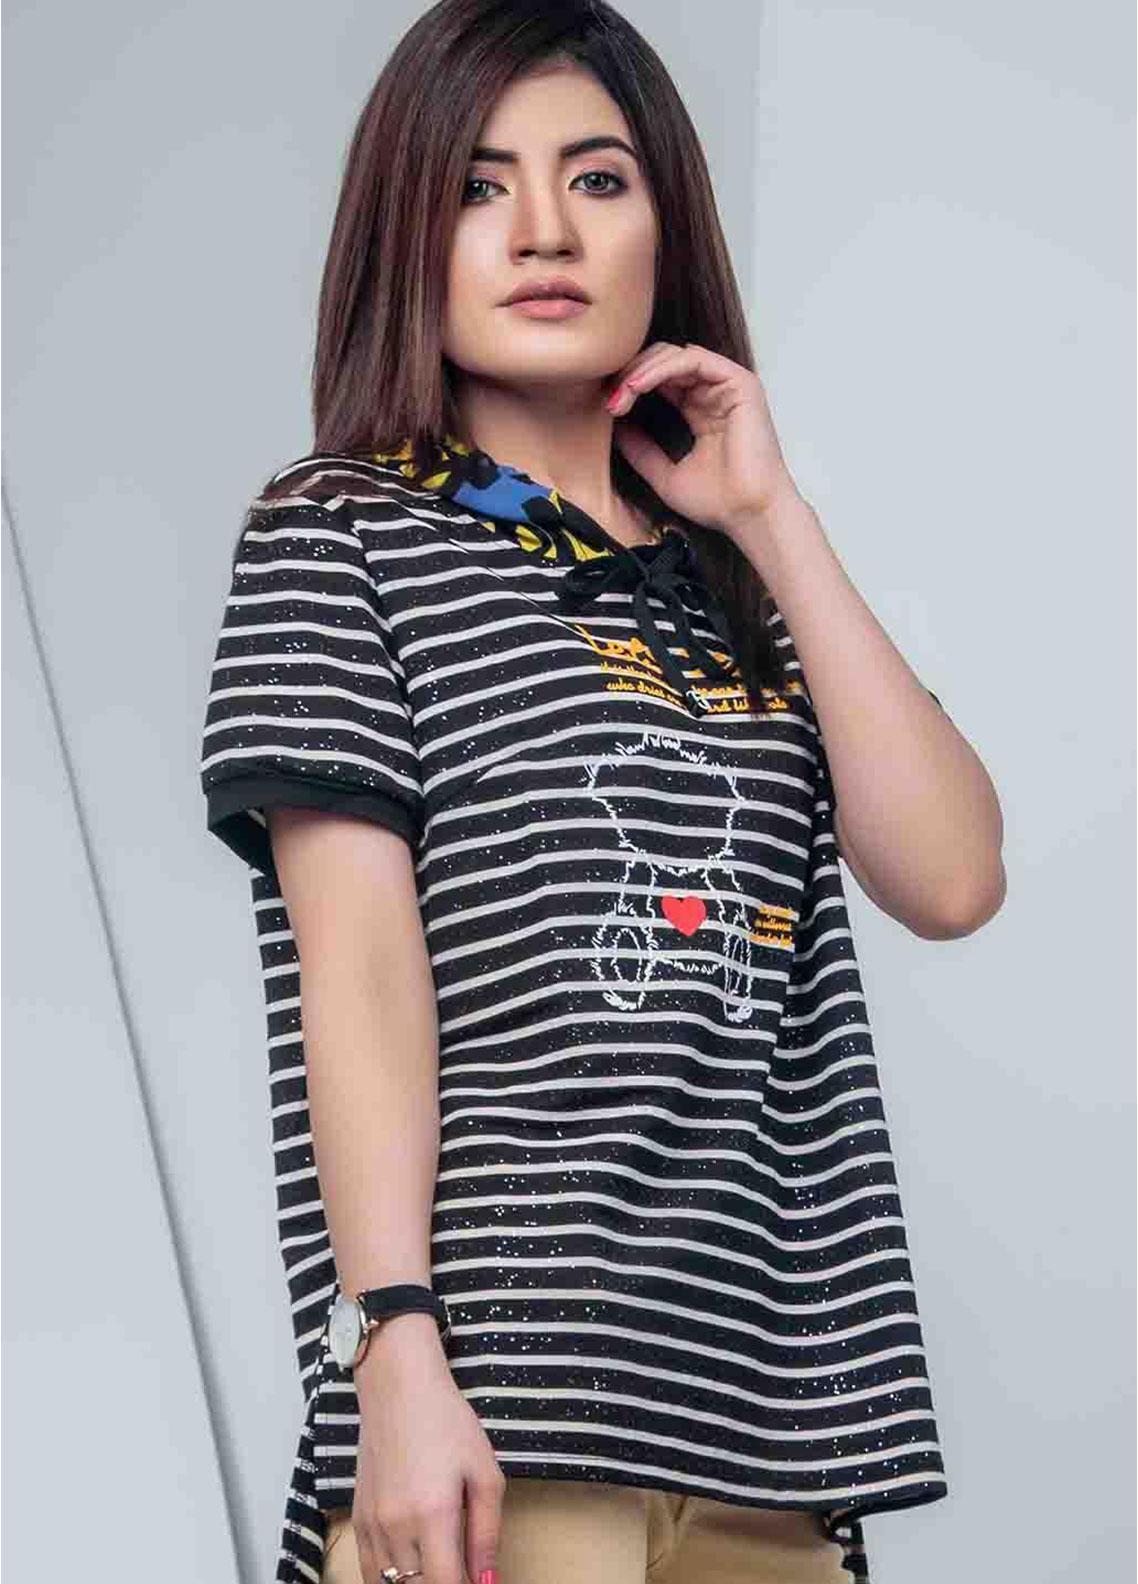 Ignite Wardrobe Casual Striped Cotton Hoodie T-Shirt IG20HDW 002